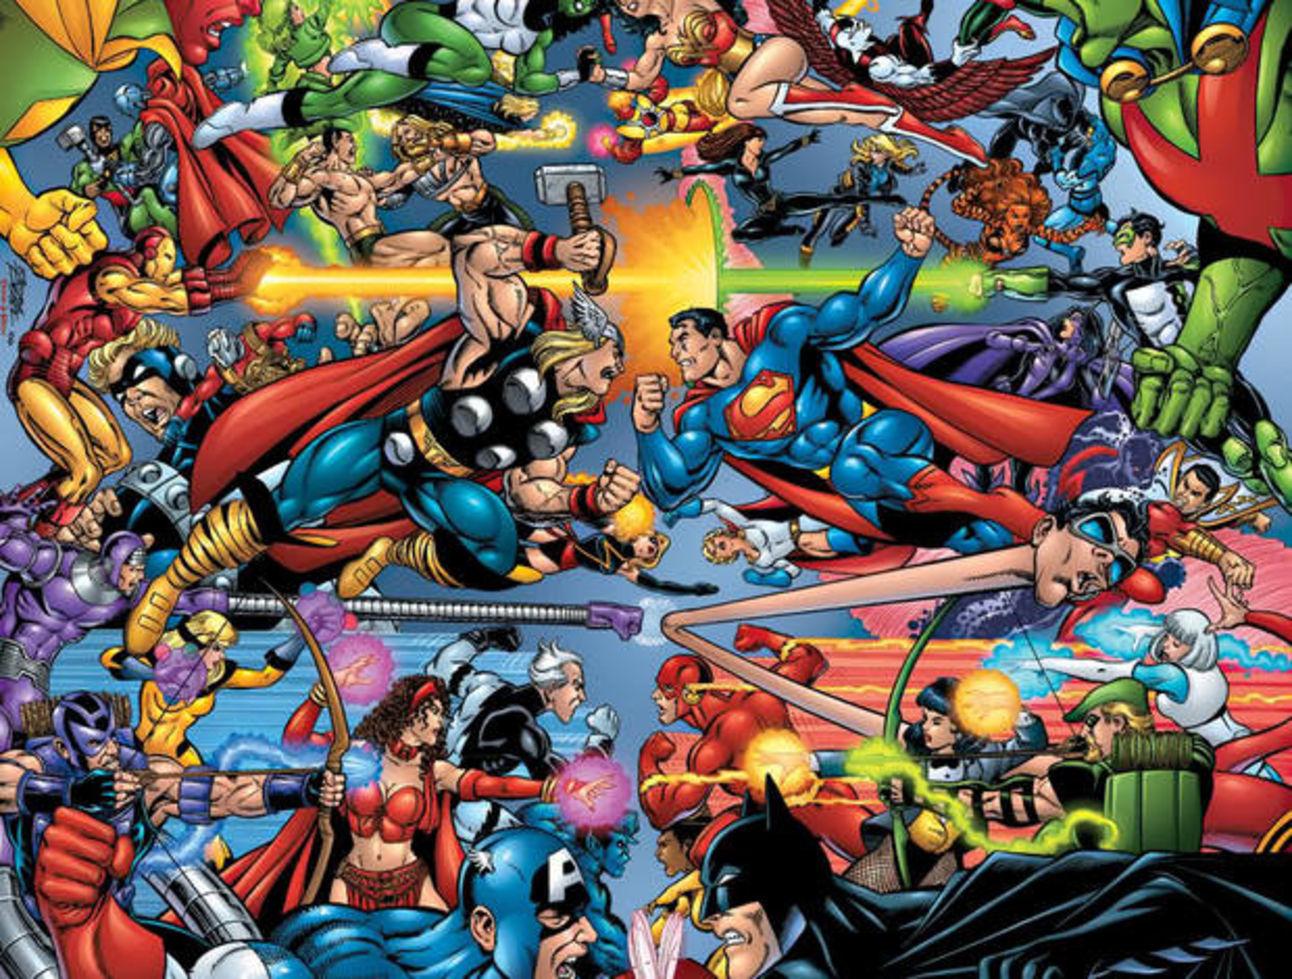 marvel-vs-dc1-a-marvel-vs-dc-crossover-isn-t-impossible-could-an-amalgam-vs-movie-hit-cinemas-jpeg-144150.jpg